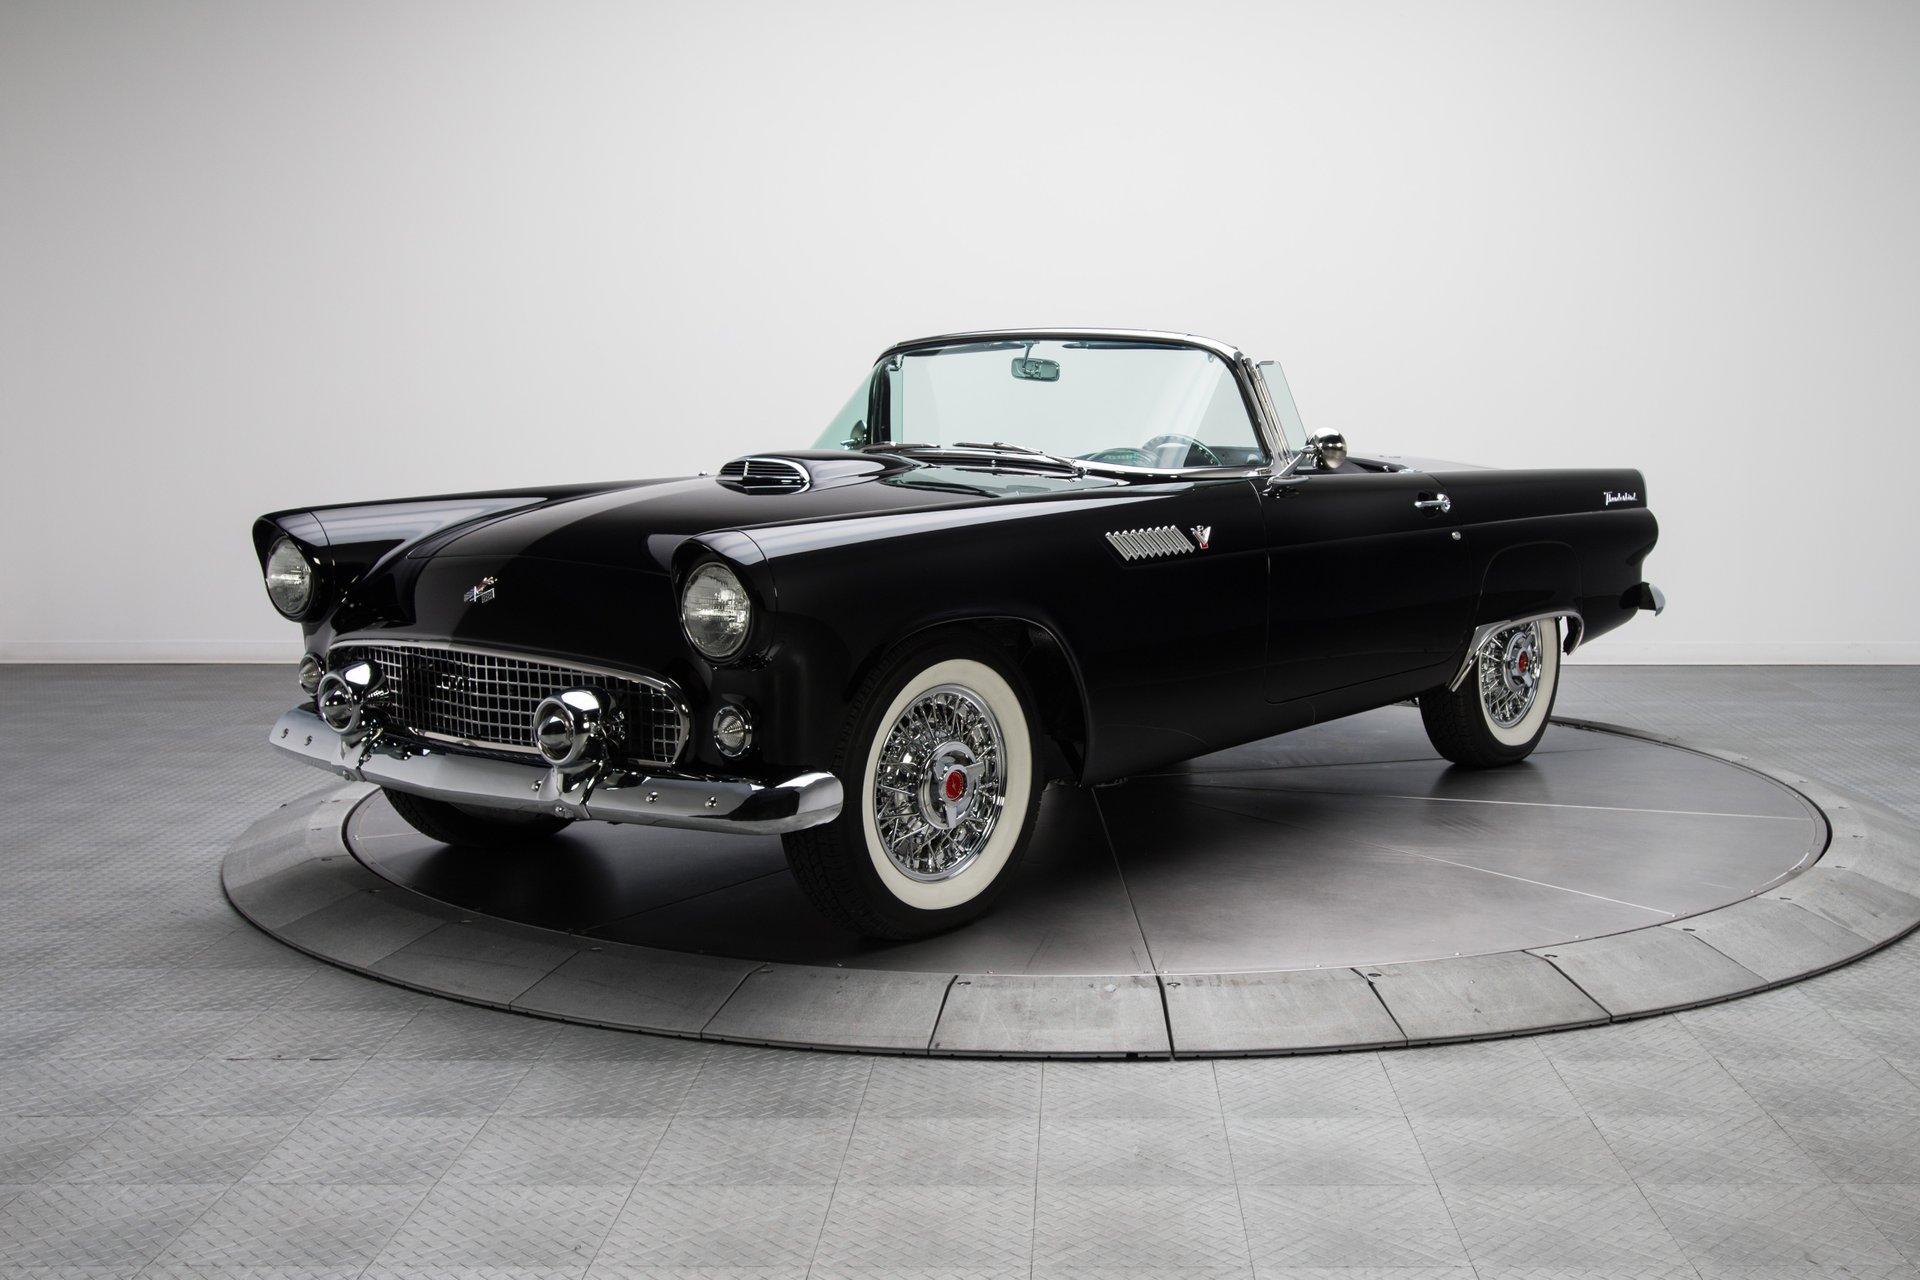 5249c1e2f2 134708 1955 Ford Thunderbird RK Motors Classic Cars for Sale